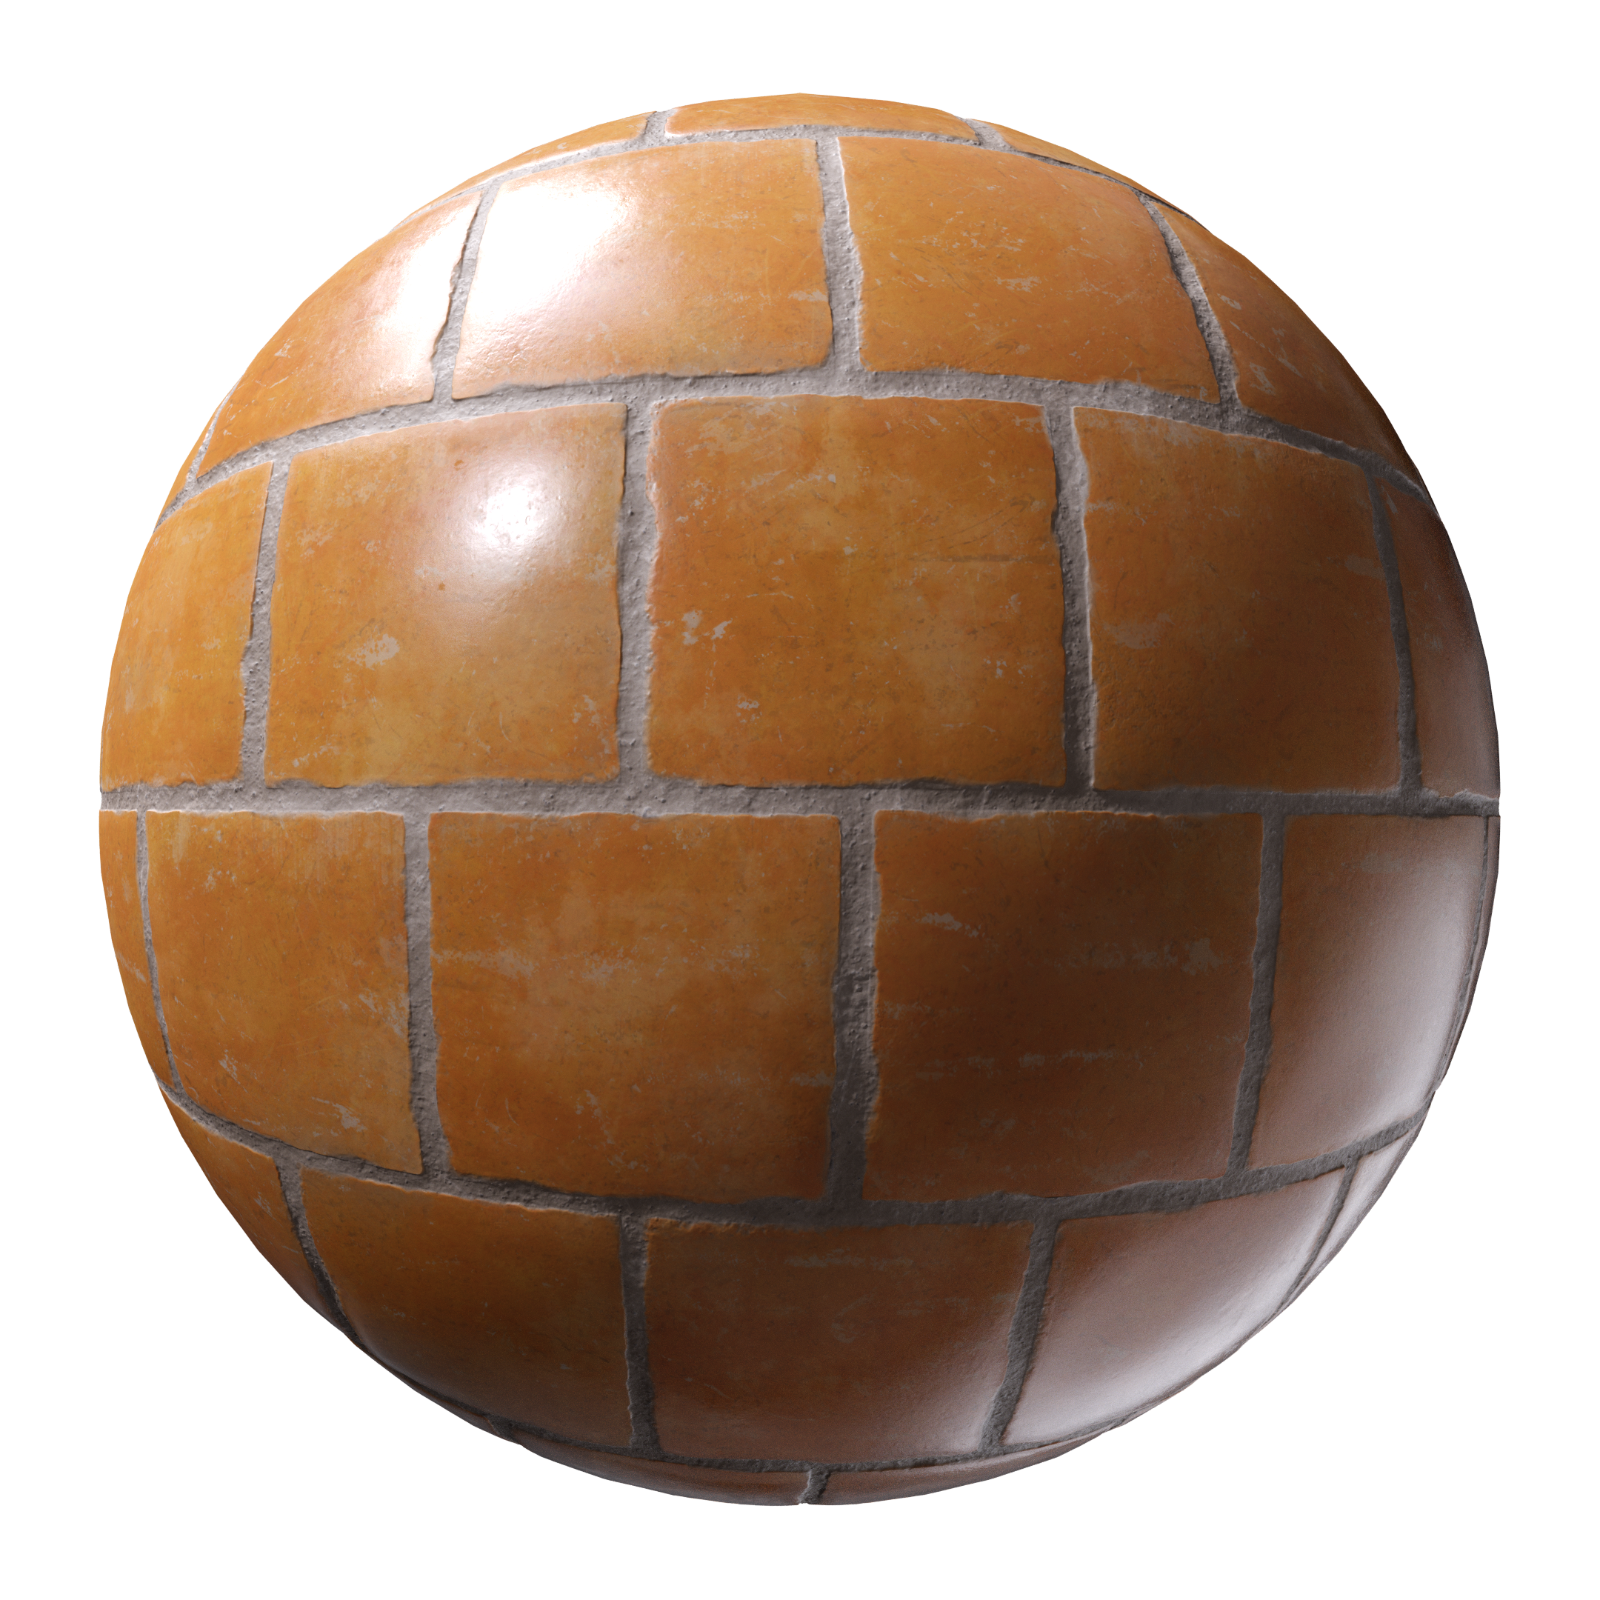 Glazed Bricks